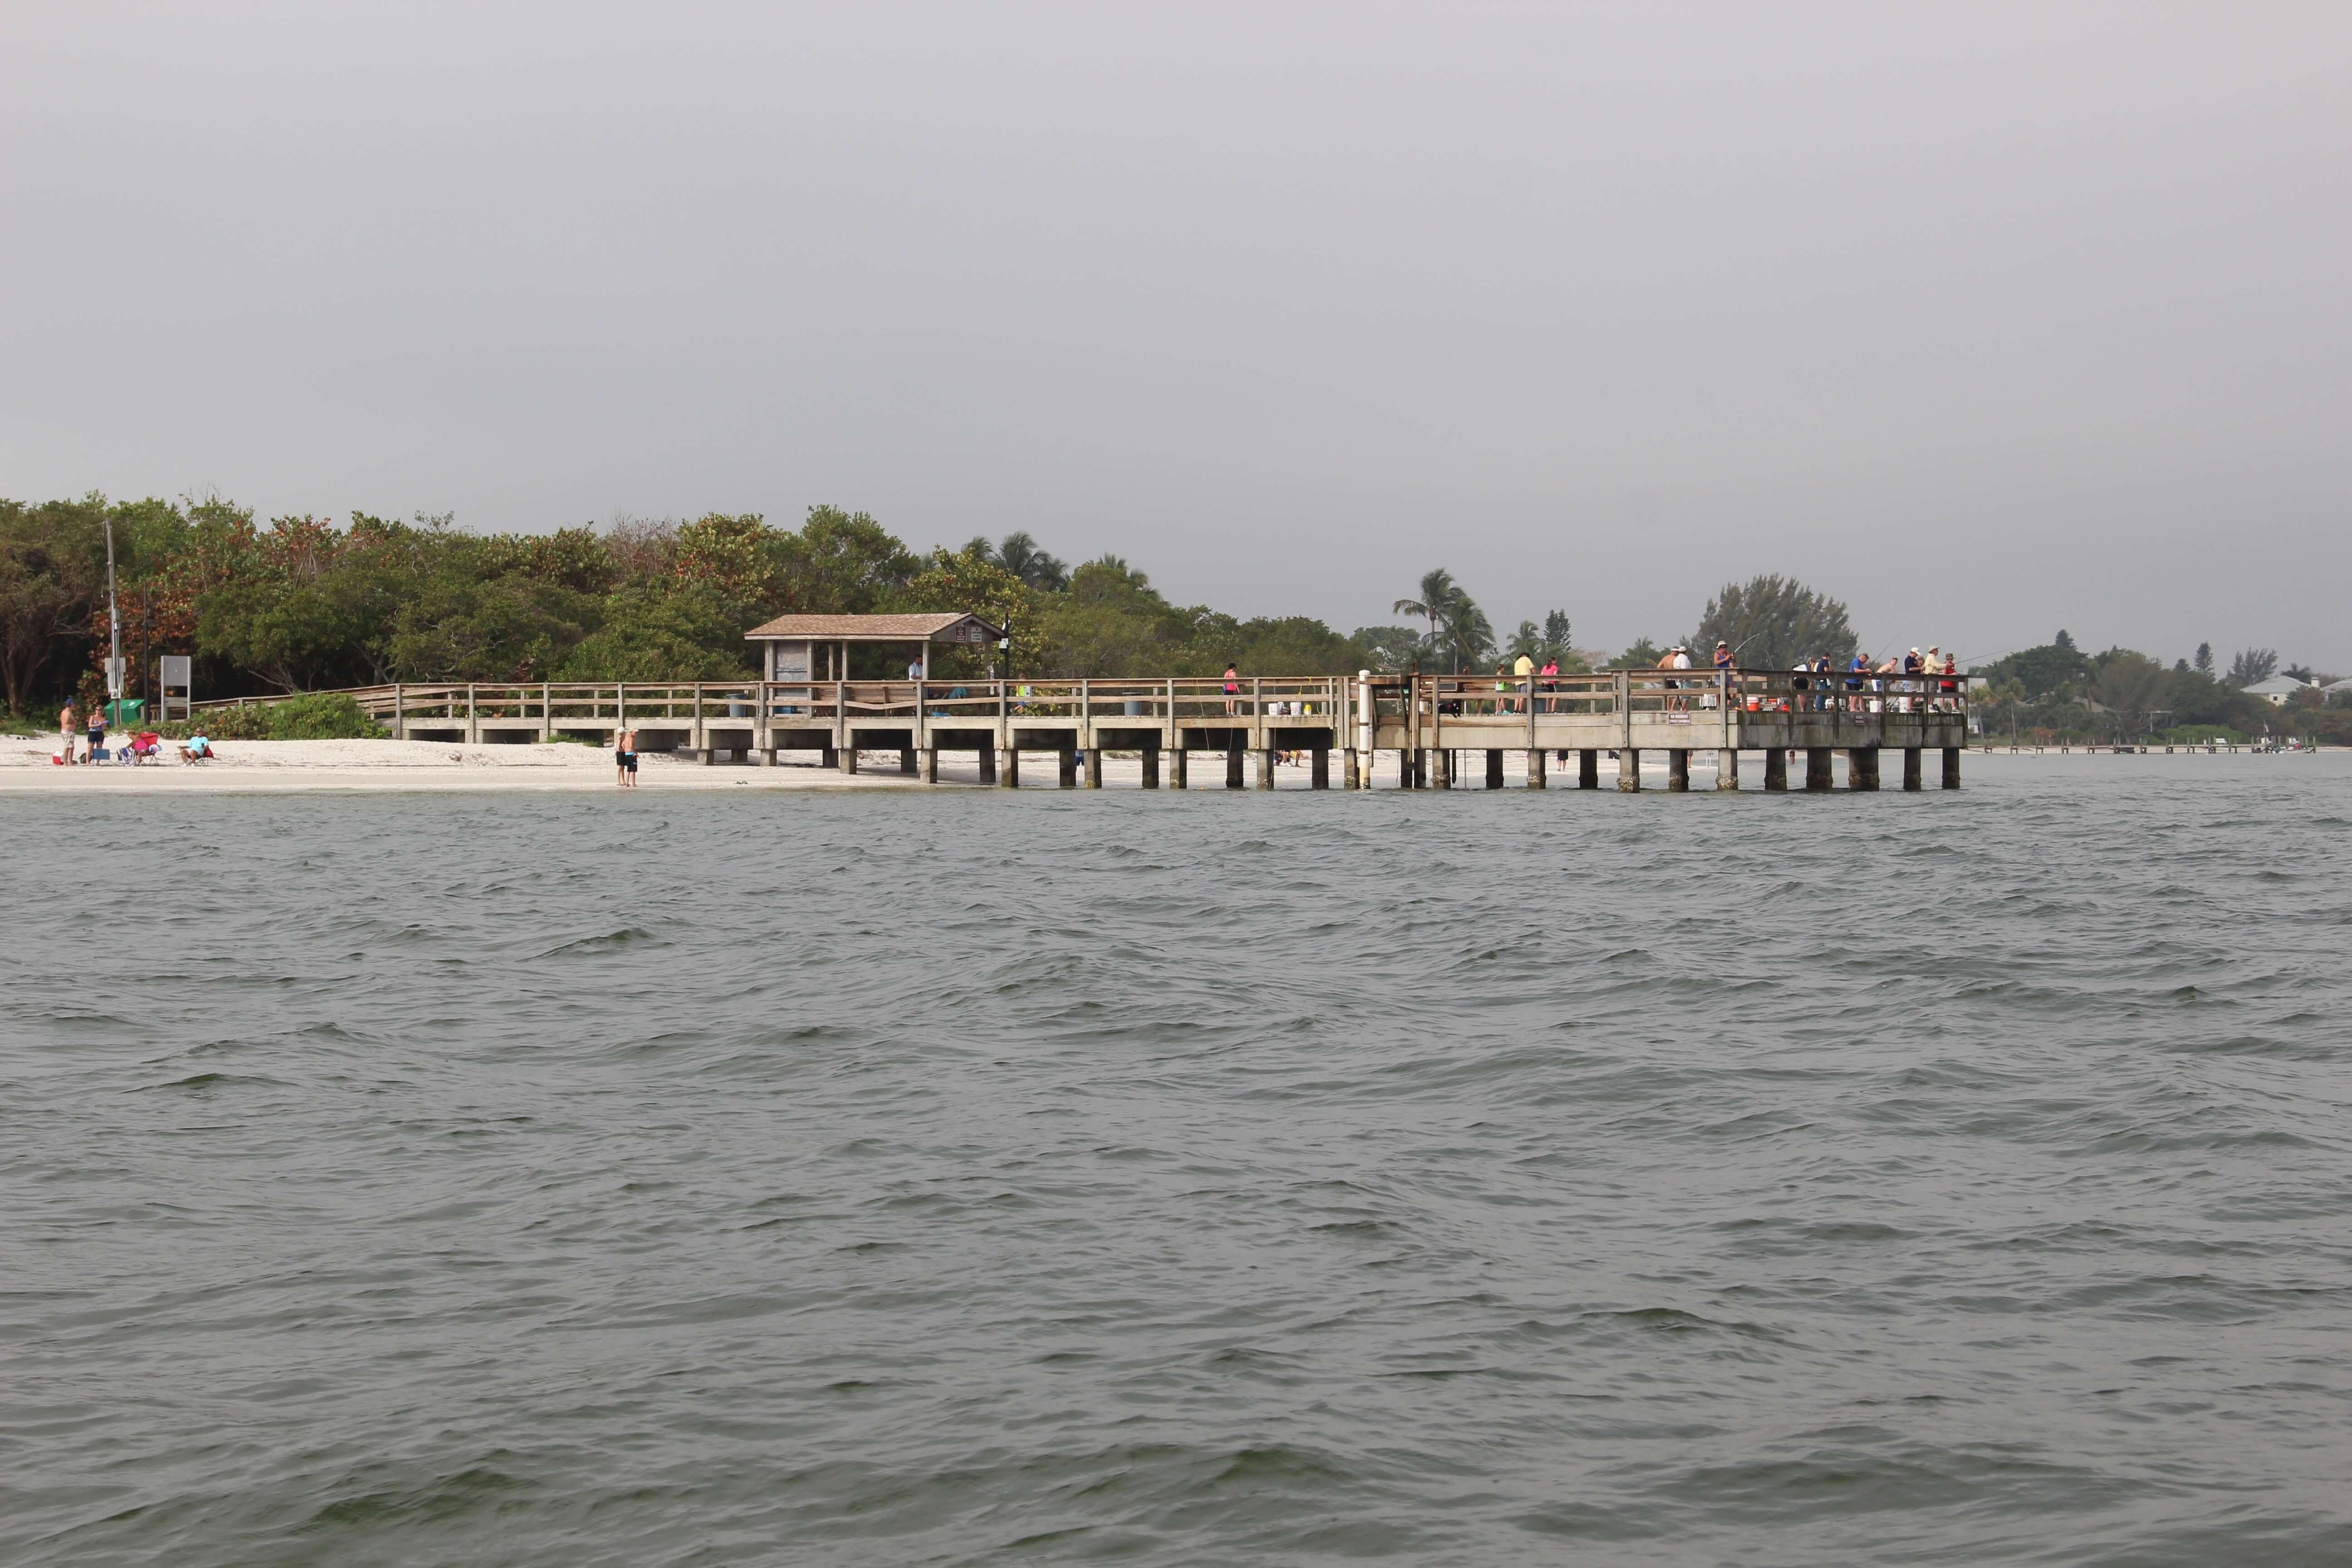 Lake Okeechobee releases hurt vegetation and estuaries